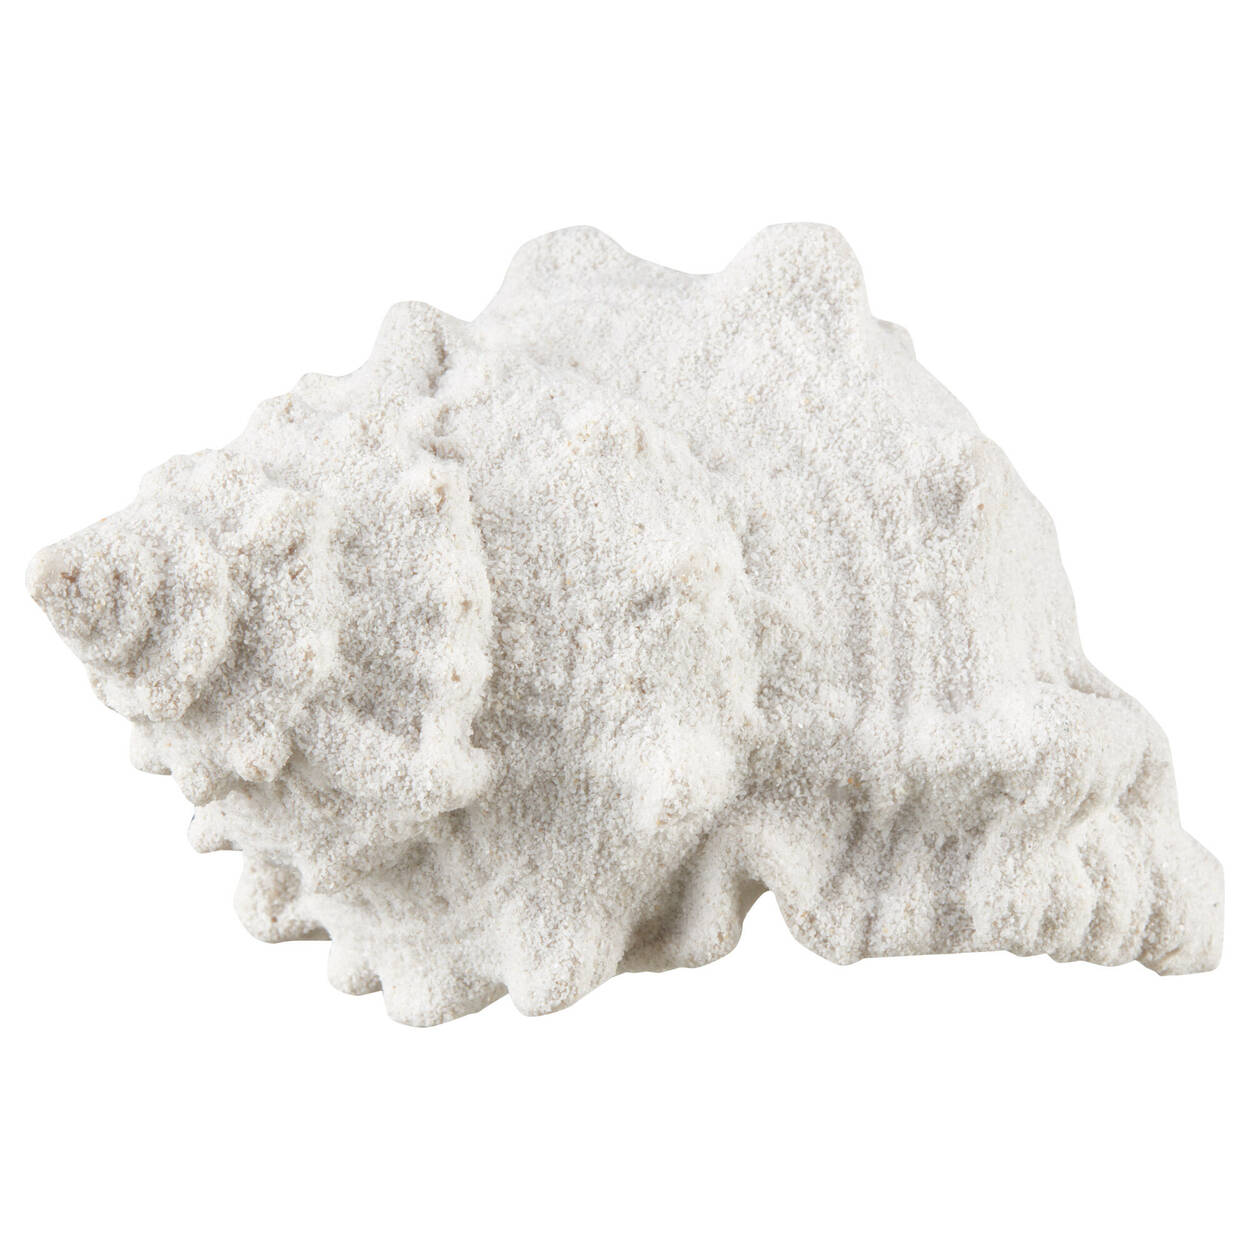 Decorative Shell